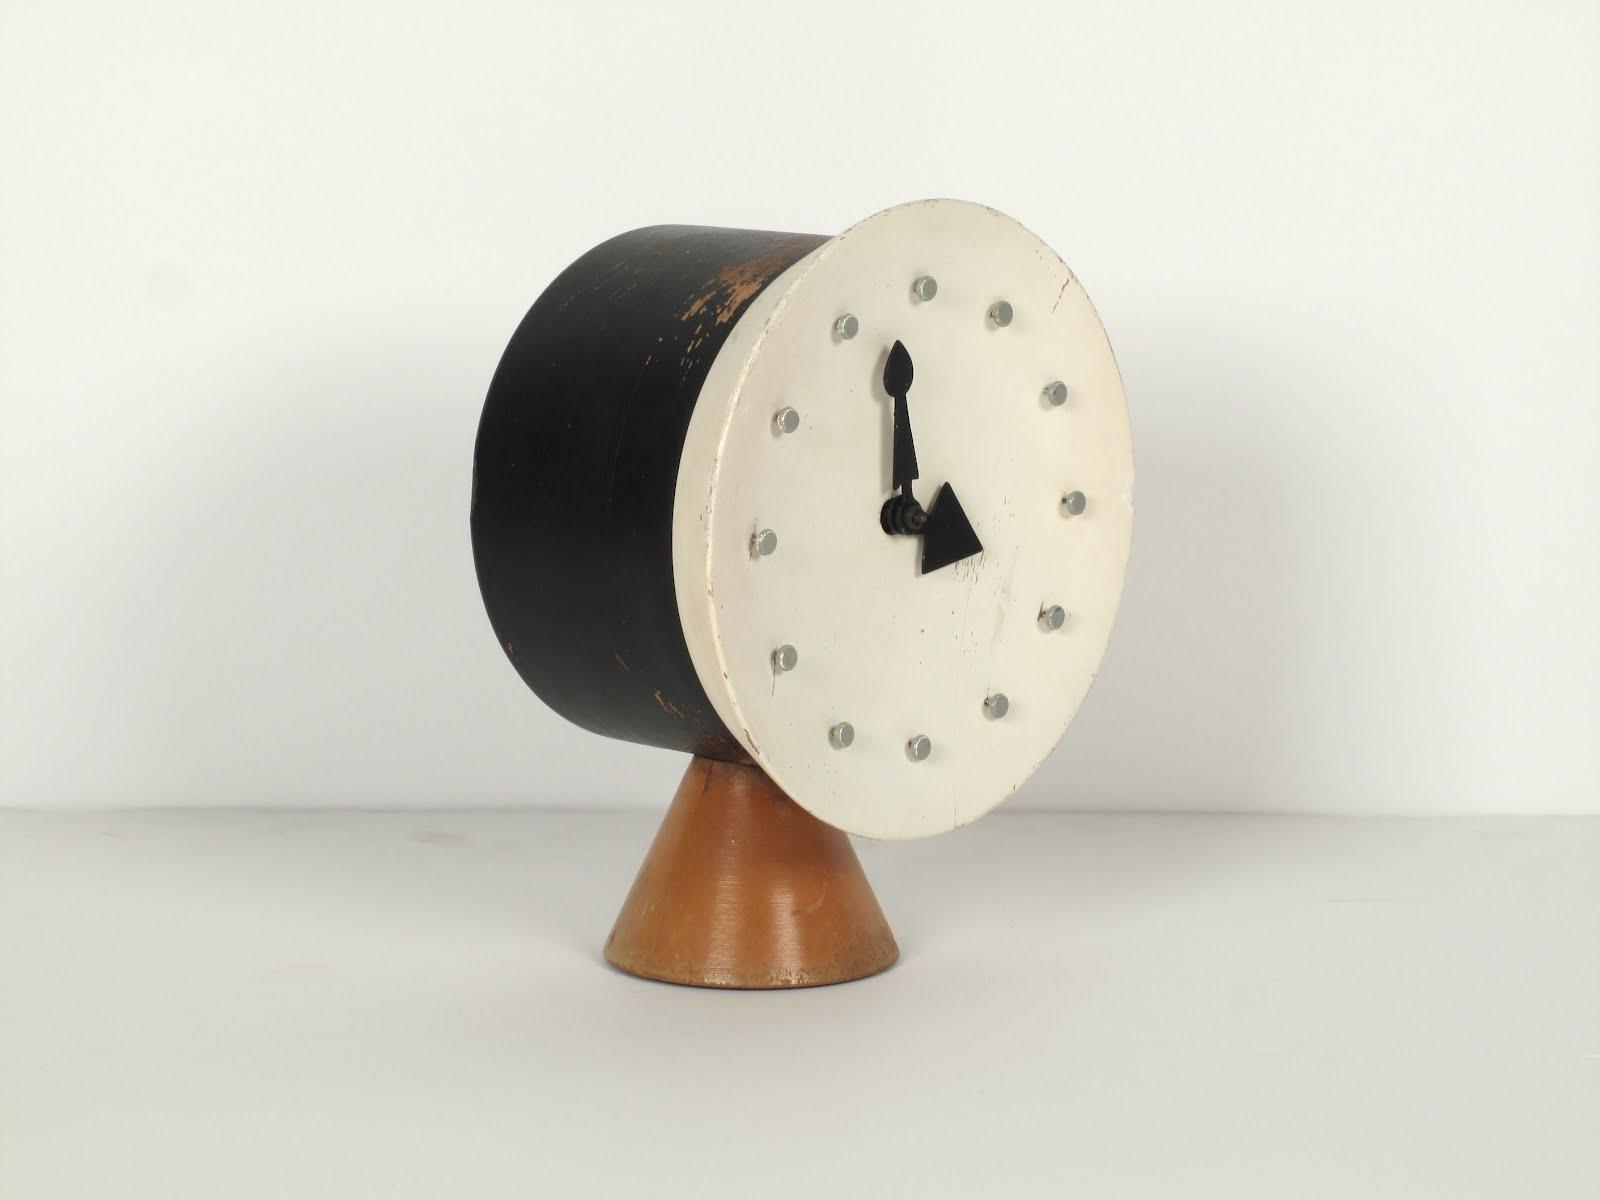 george nelson associates table clock model 4762 - Designer Desk Clock